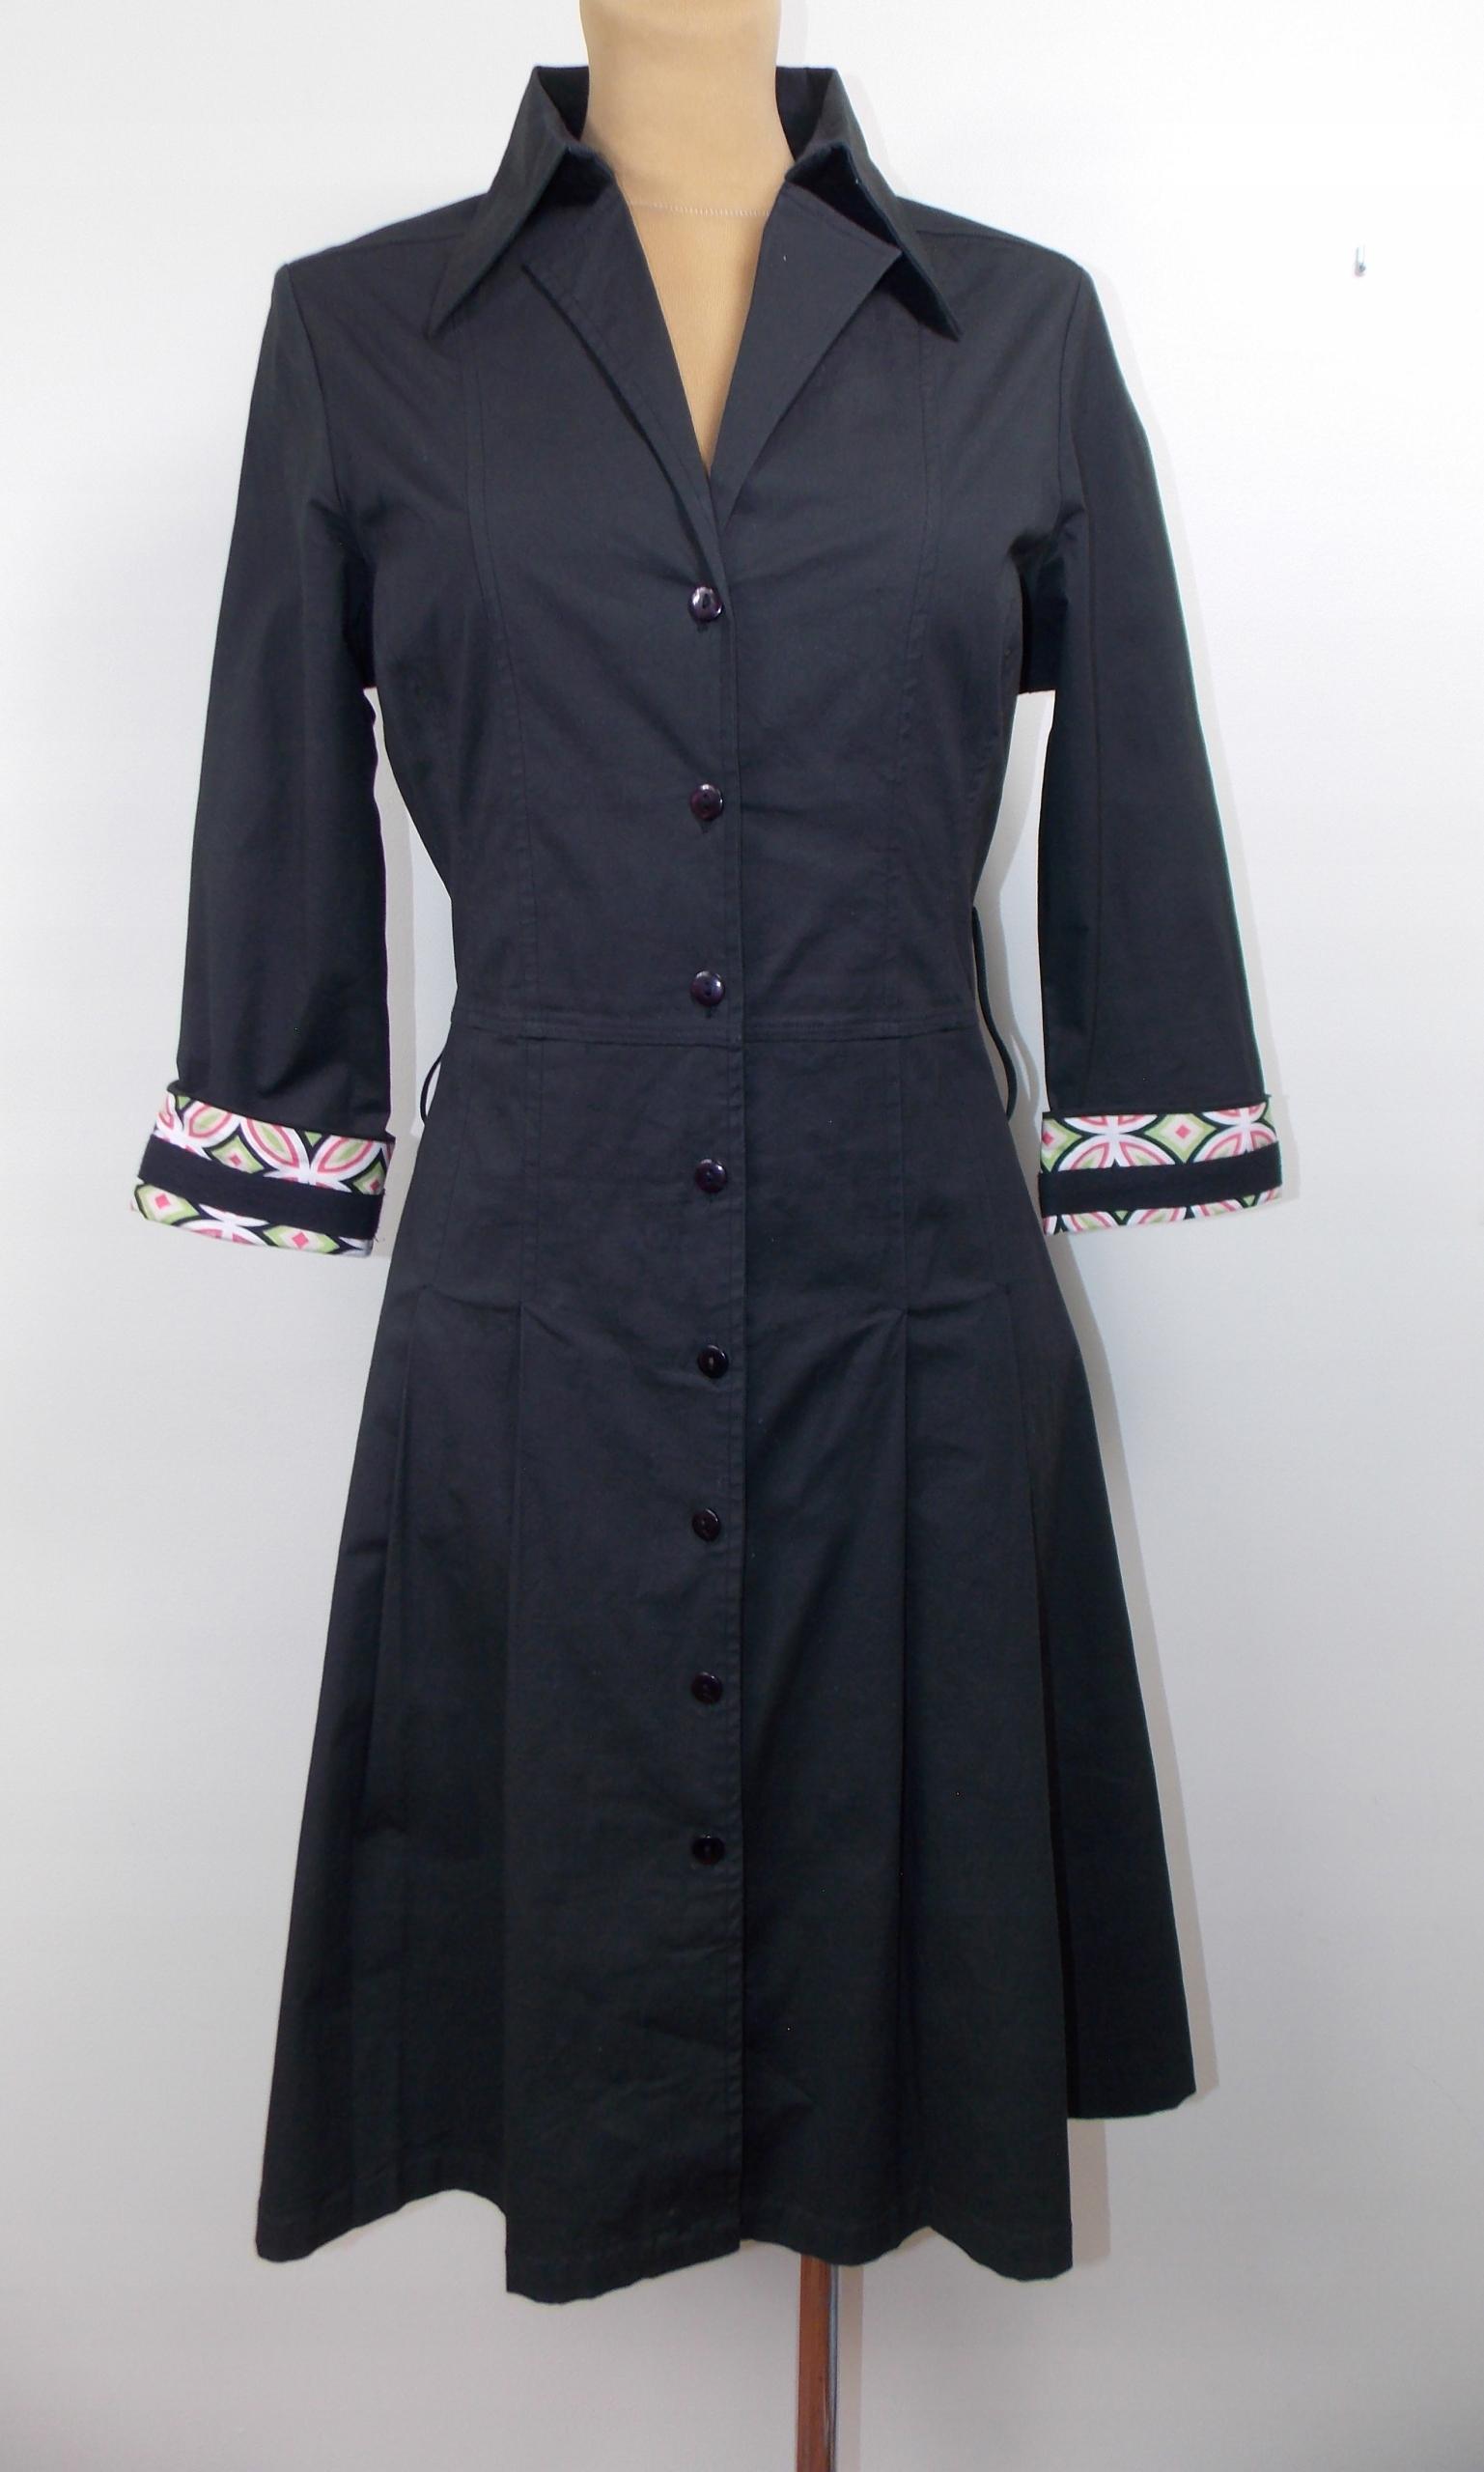 sukienka ONLY j ZARA elegancka biuro szmizjerka 36